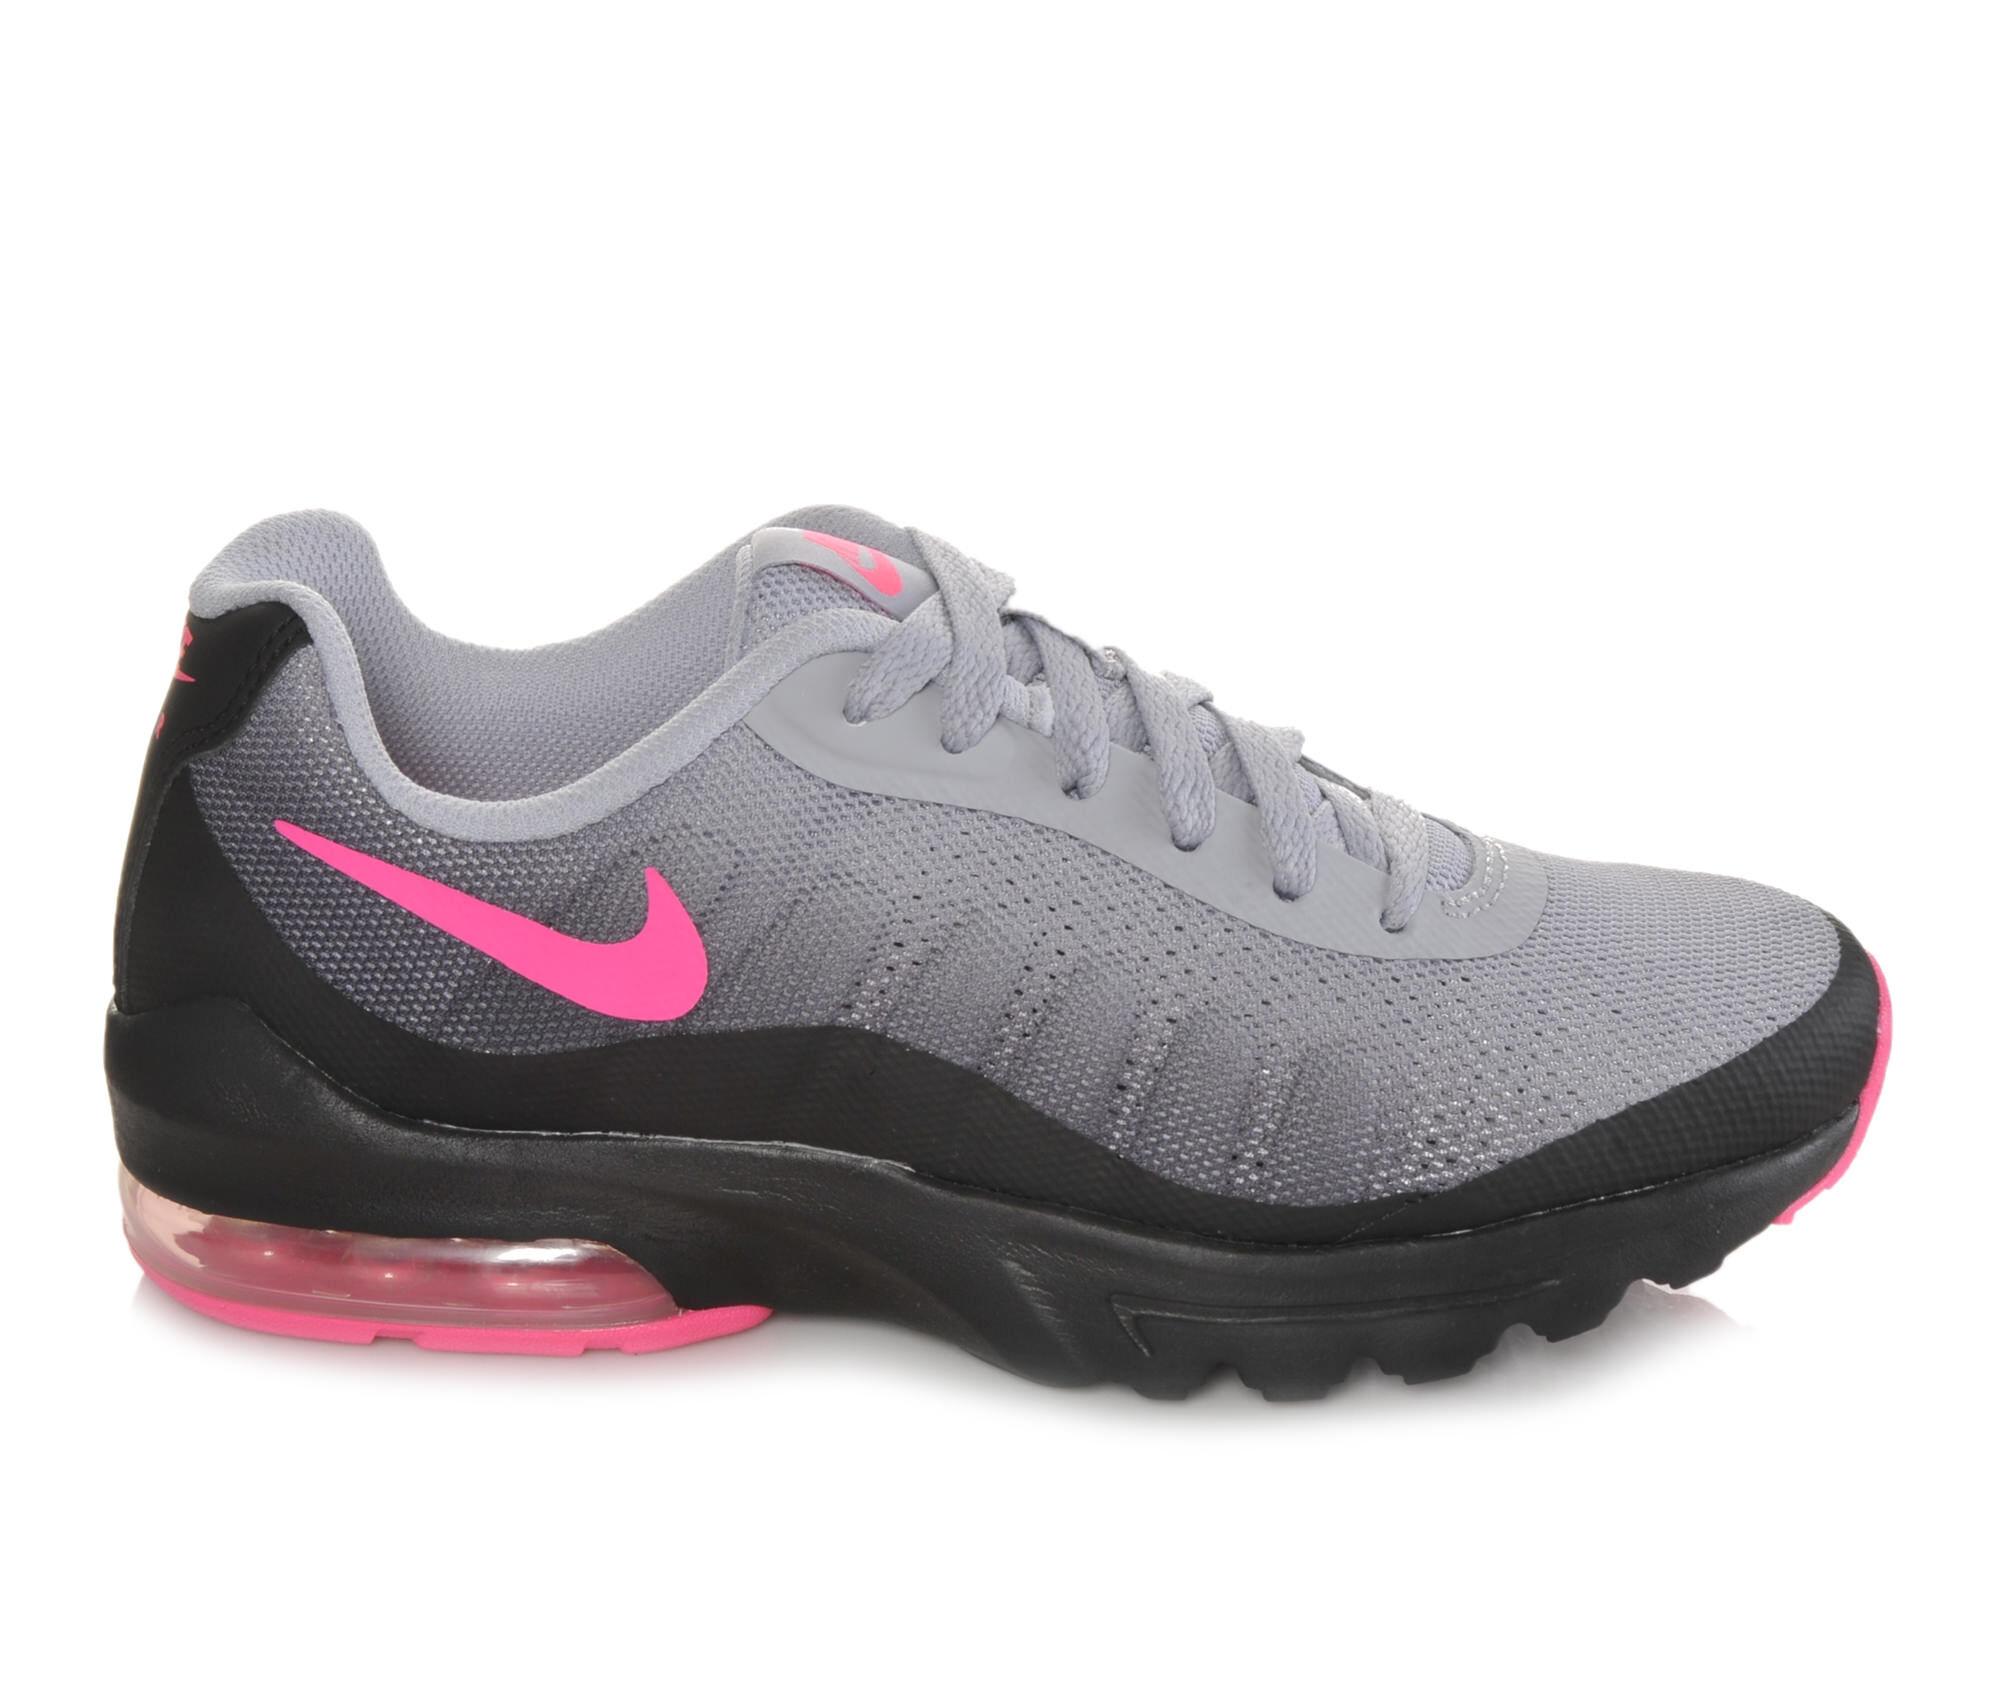 official photos 124e0 fd05c ... clearance girls nike air max invigor 3.5 7 athletic sneakers 91b9b 09baf